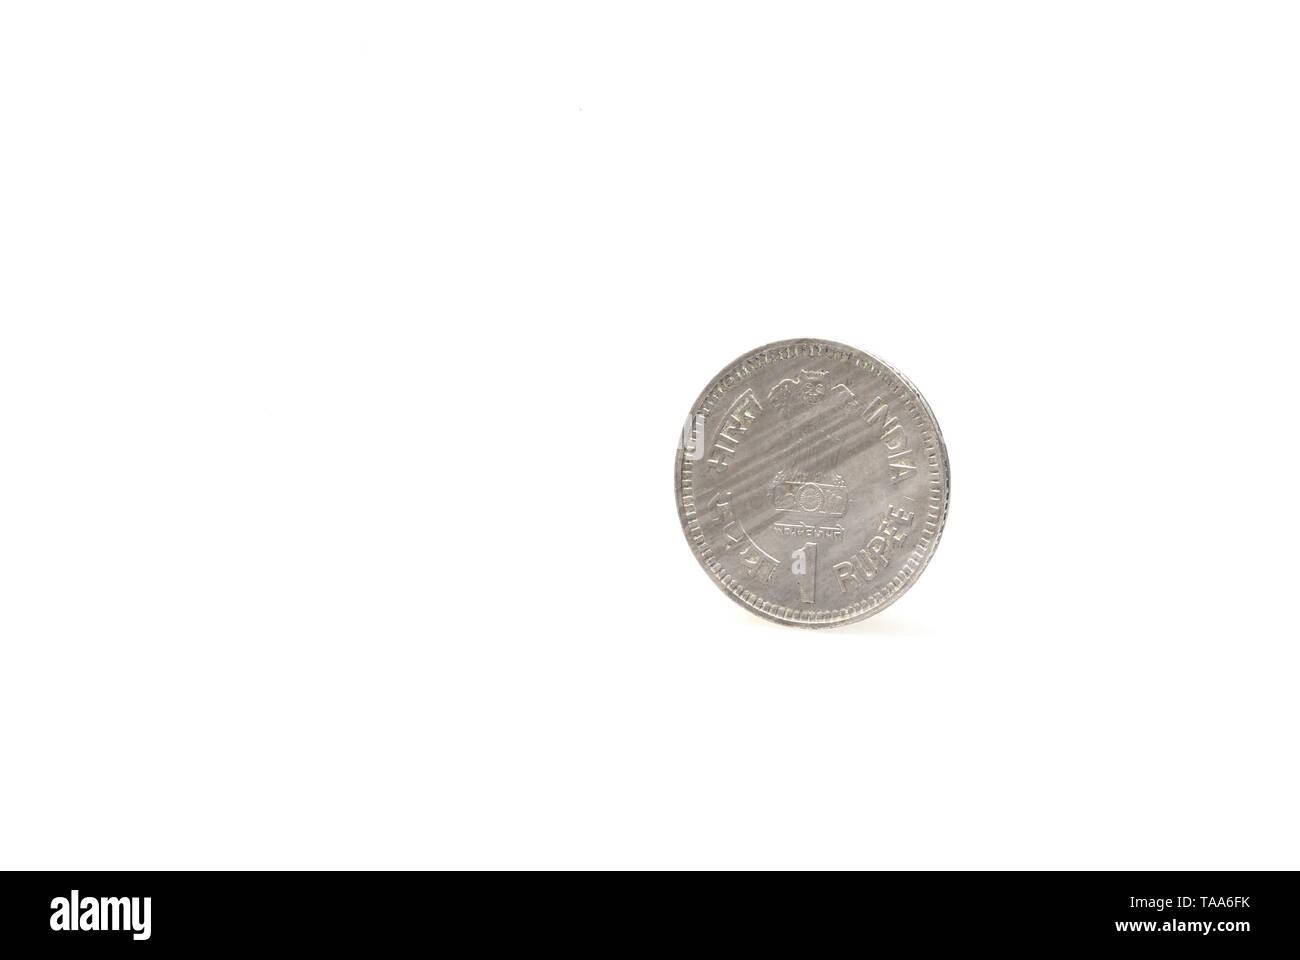 Una rupia coin sobre fondo blanco, India, Asia, 1989 Imagen De Stock